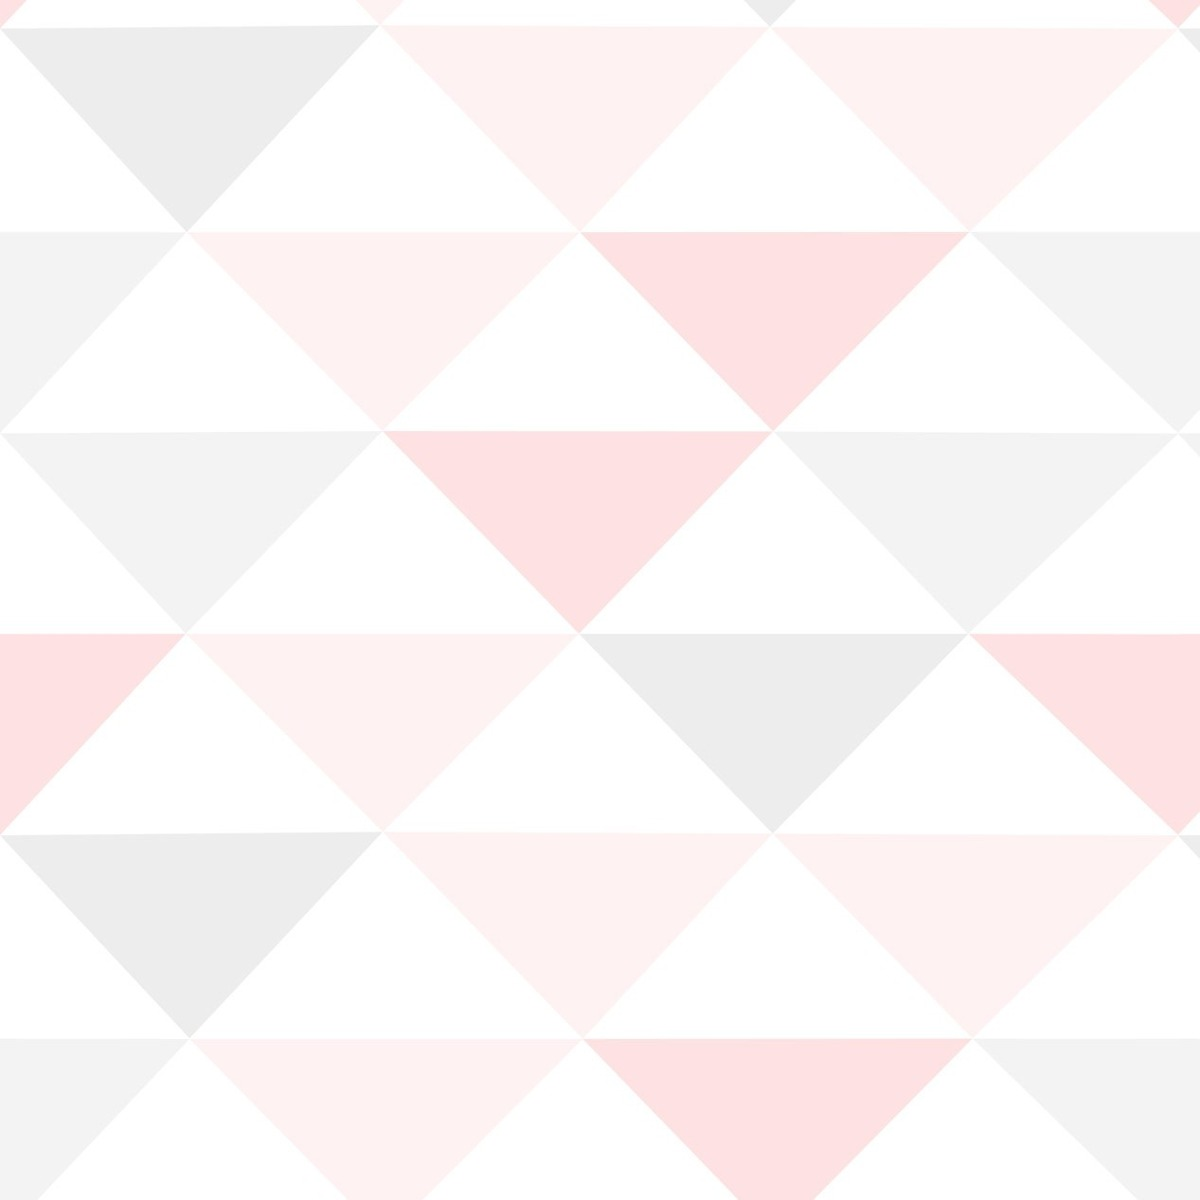 papel de parede geométrico menina triangulo rosa 500x58cm r 82 90